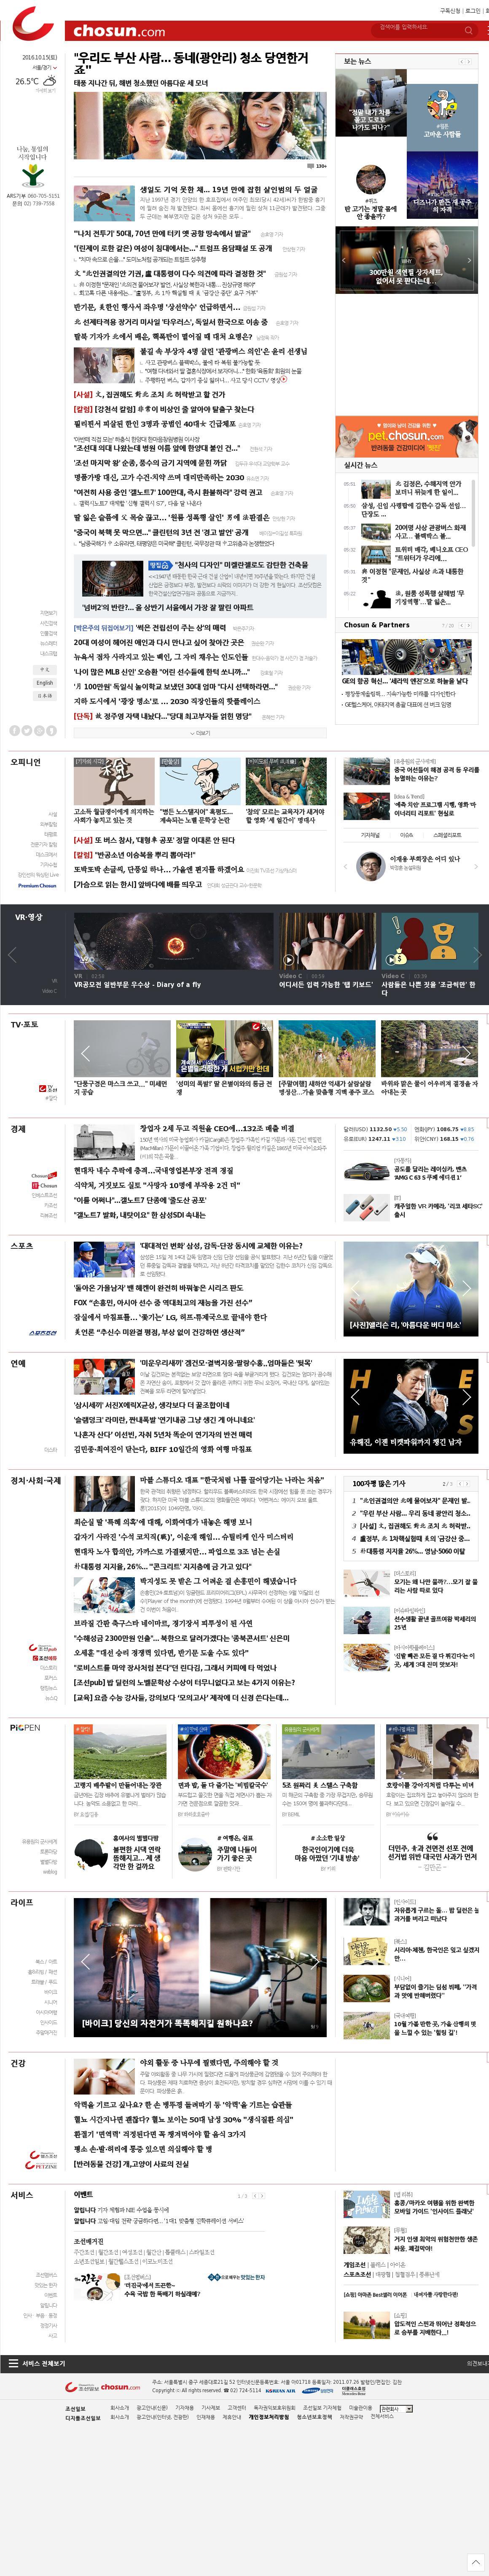 chosun.com at Saturday Oct. 15, 2016, 6:01 a.m. UTC